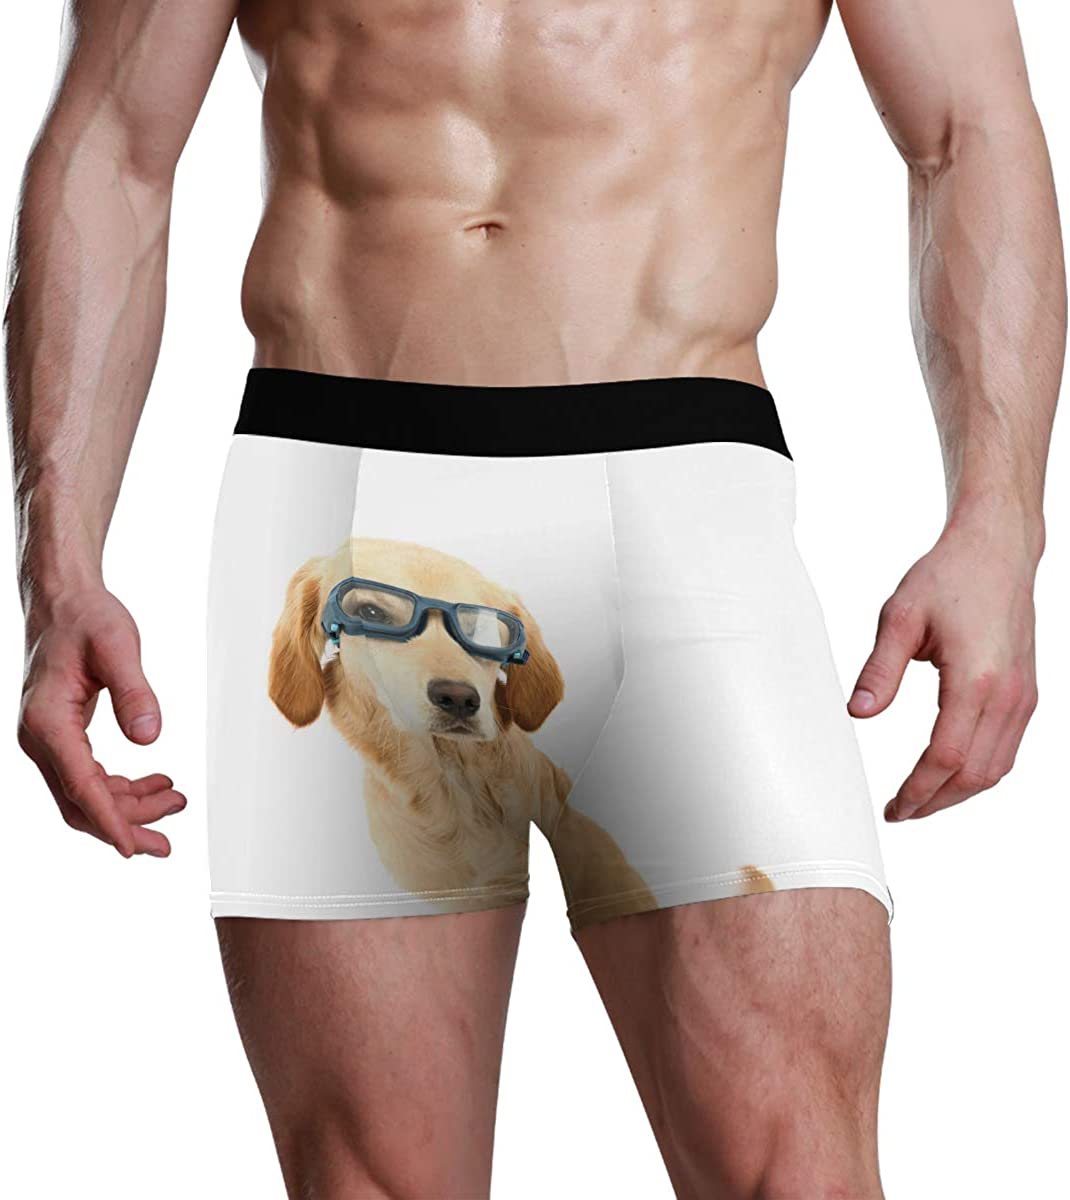 Mens Underwear Briefs Funny Golden Retriever Puppy Dog Wearing Goggles Against Breathable Long Boxer Briefs Underwear Boys